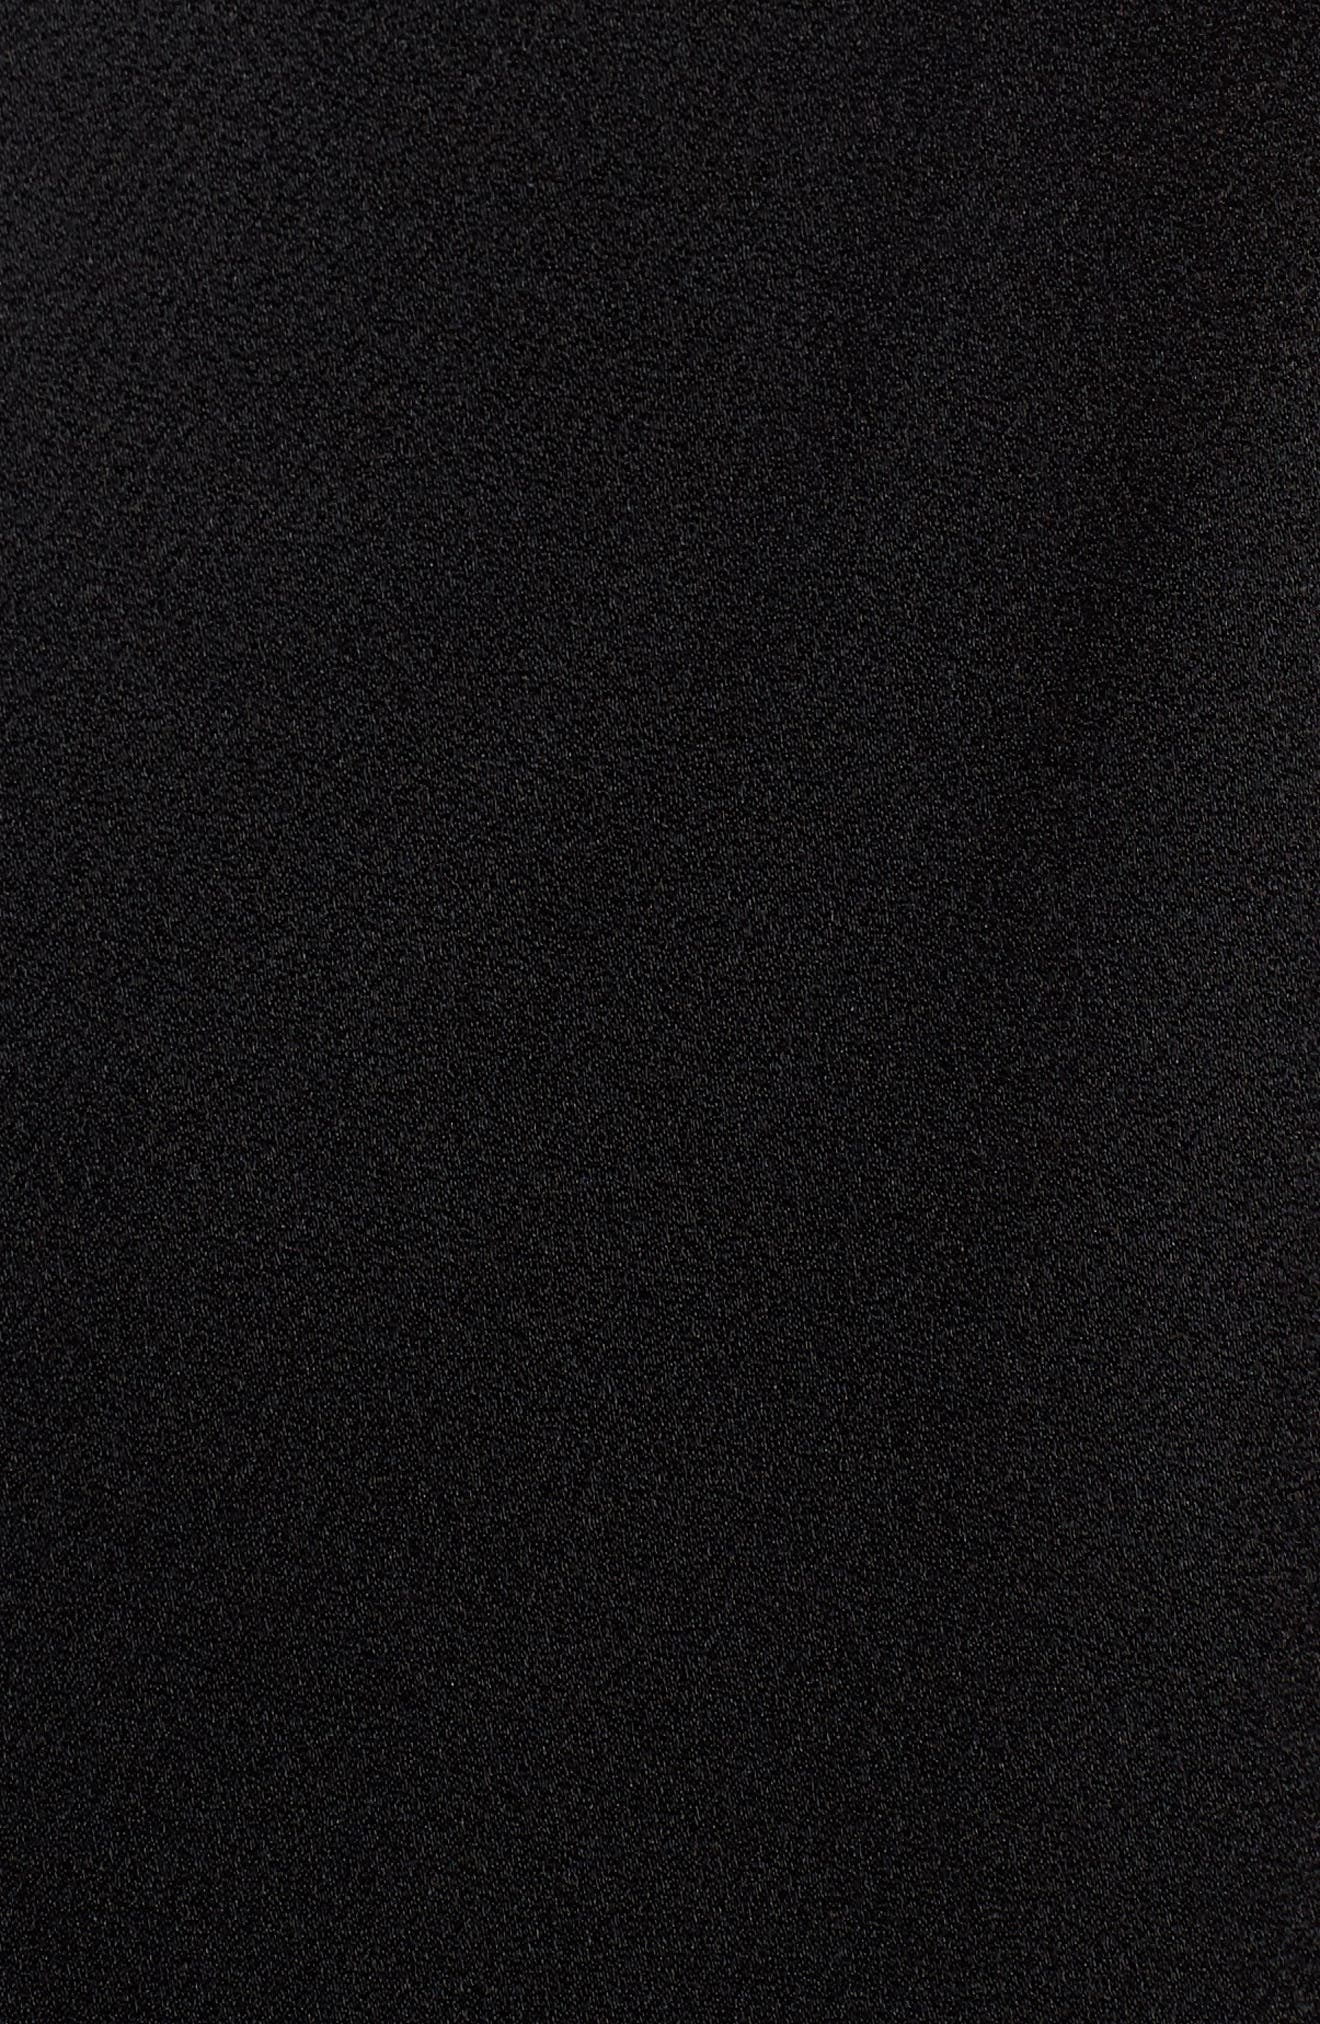 Daviana Sheath Dress,                             Alternate thumbnail 5, color,                             Black